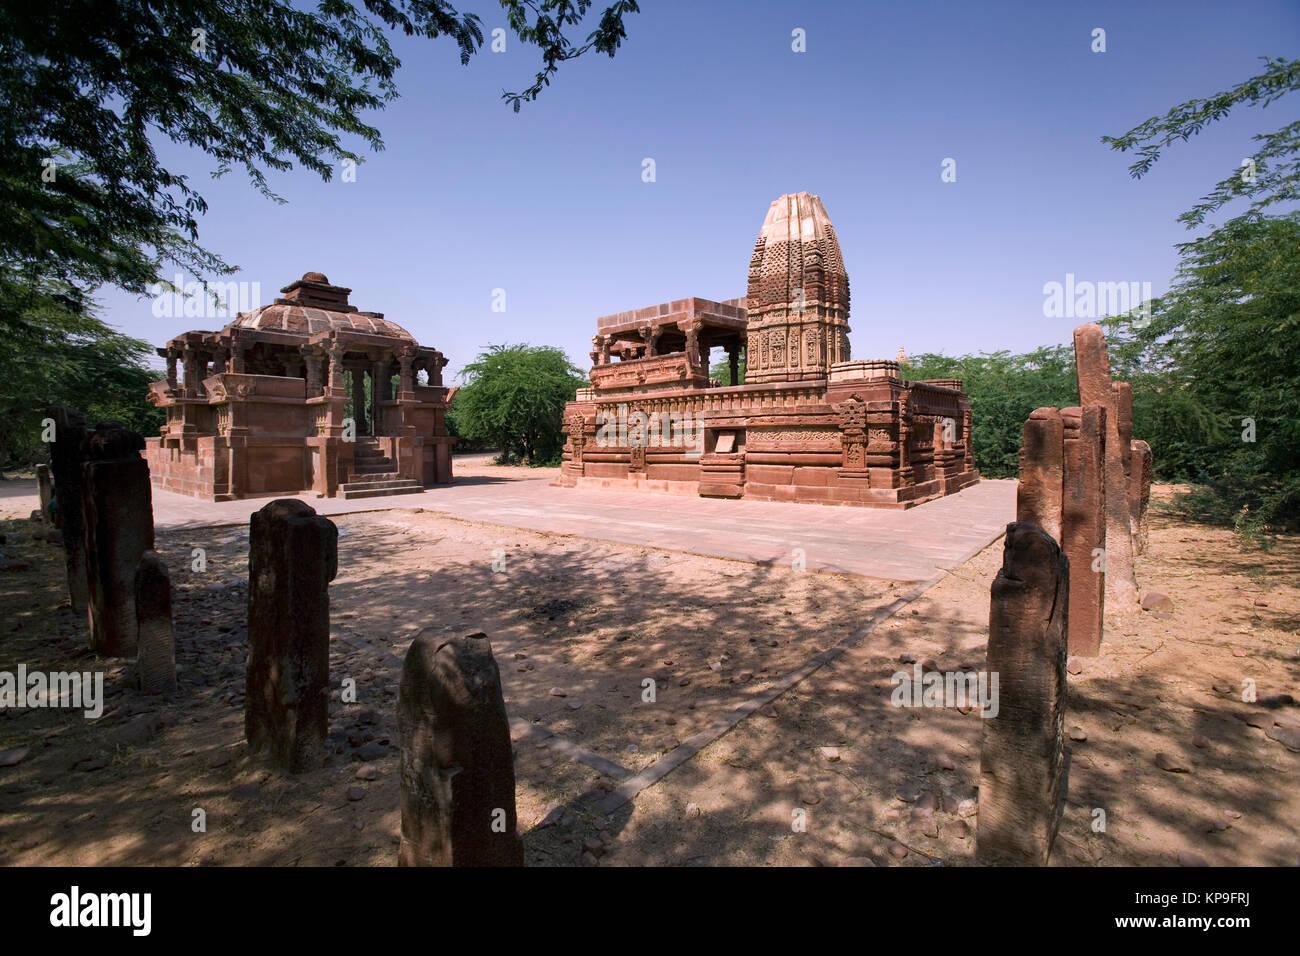 Harihara Temple in the town of Osian in western Rajasthan near Jodhpur in India. - Stock Image